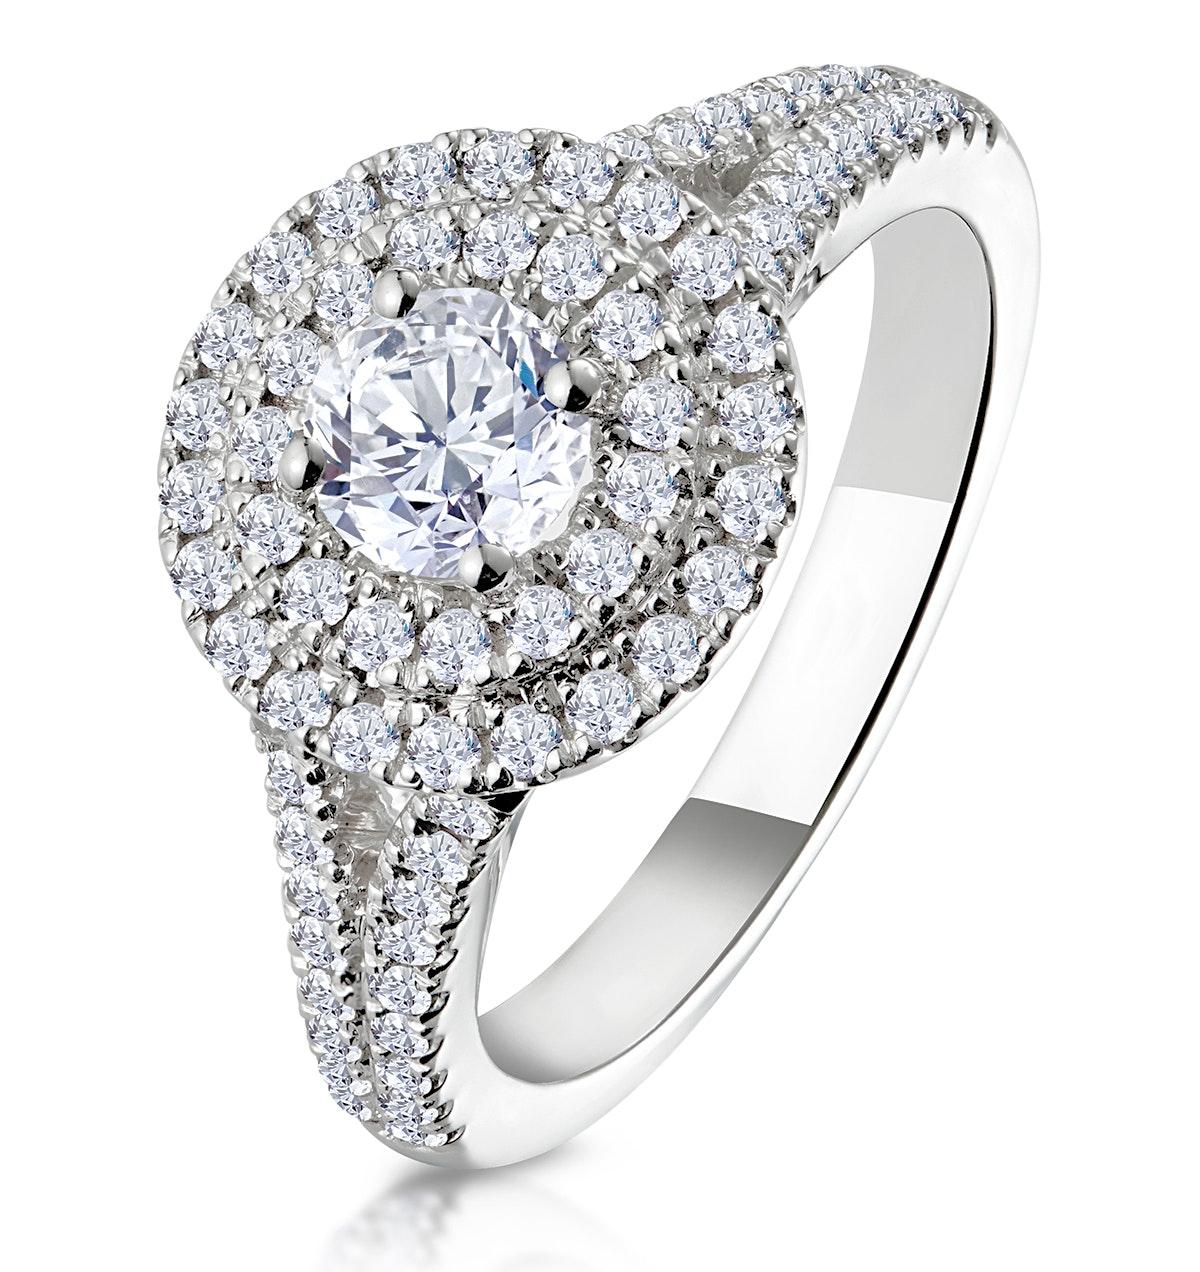 Camilla GIA Diamond Halo Engagement Ring in Platinum 1.15ct G/VS1